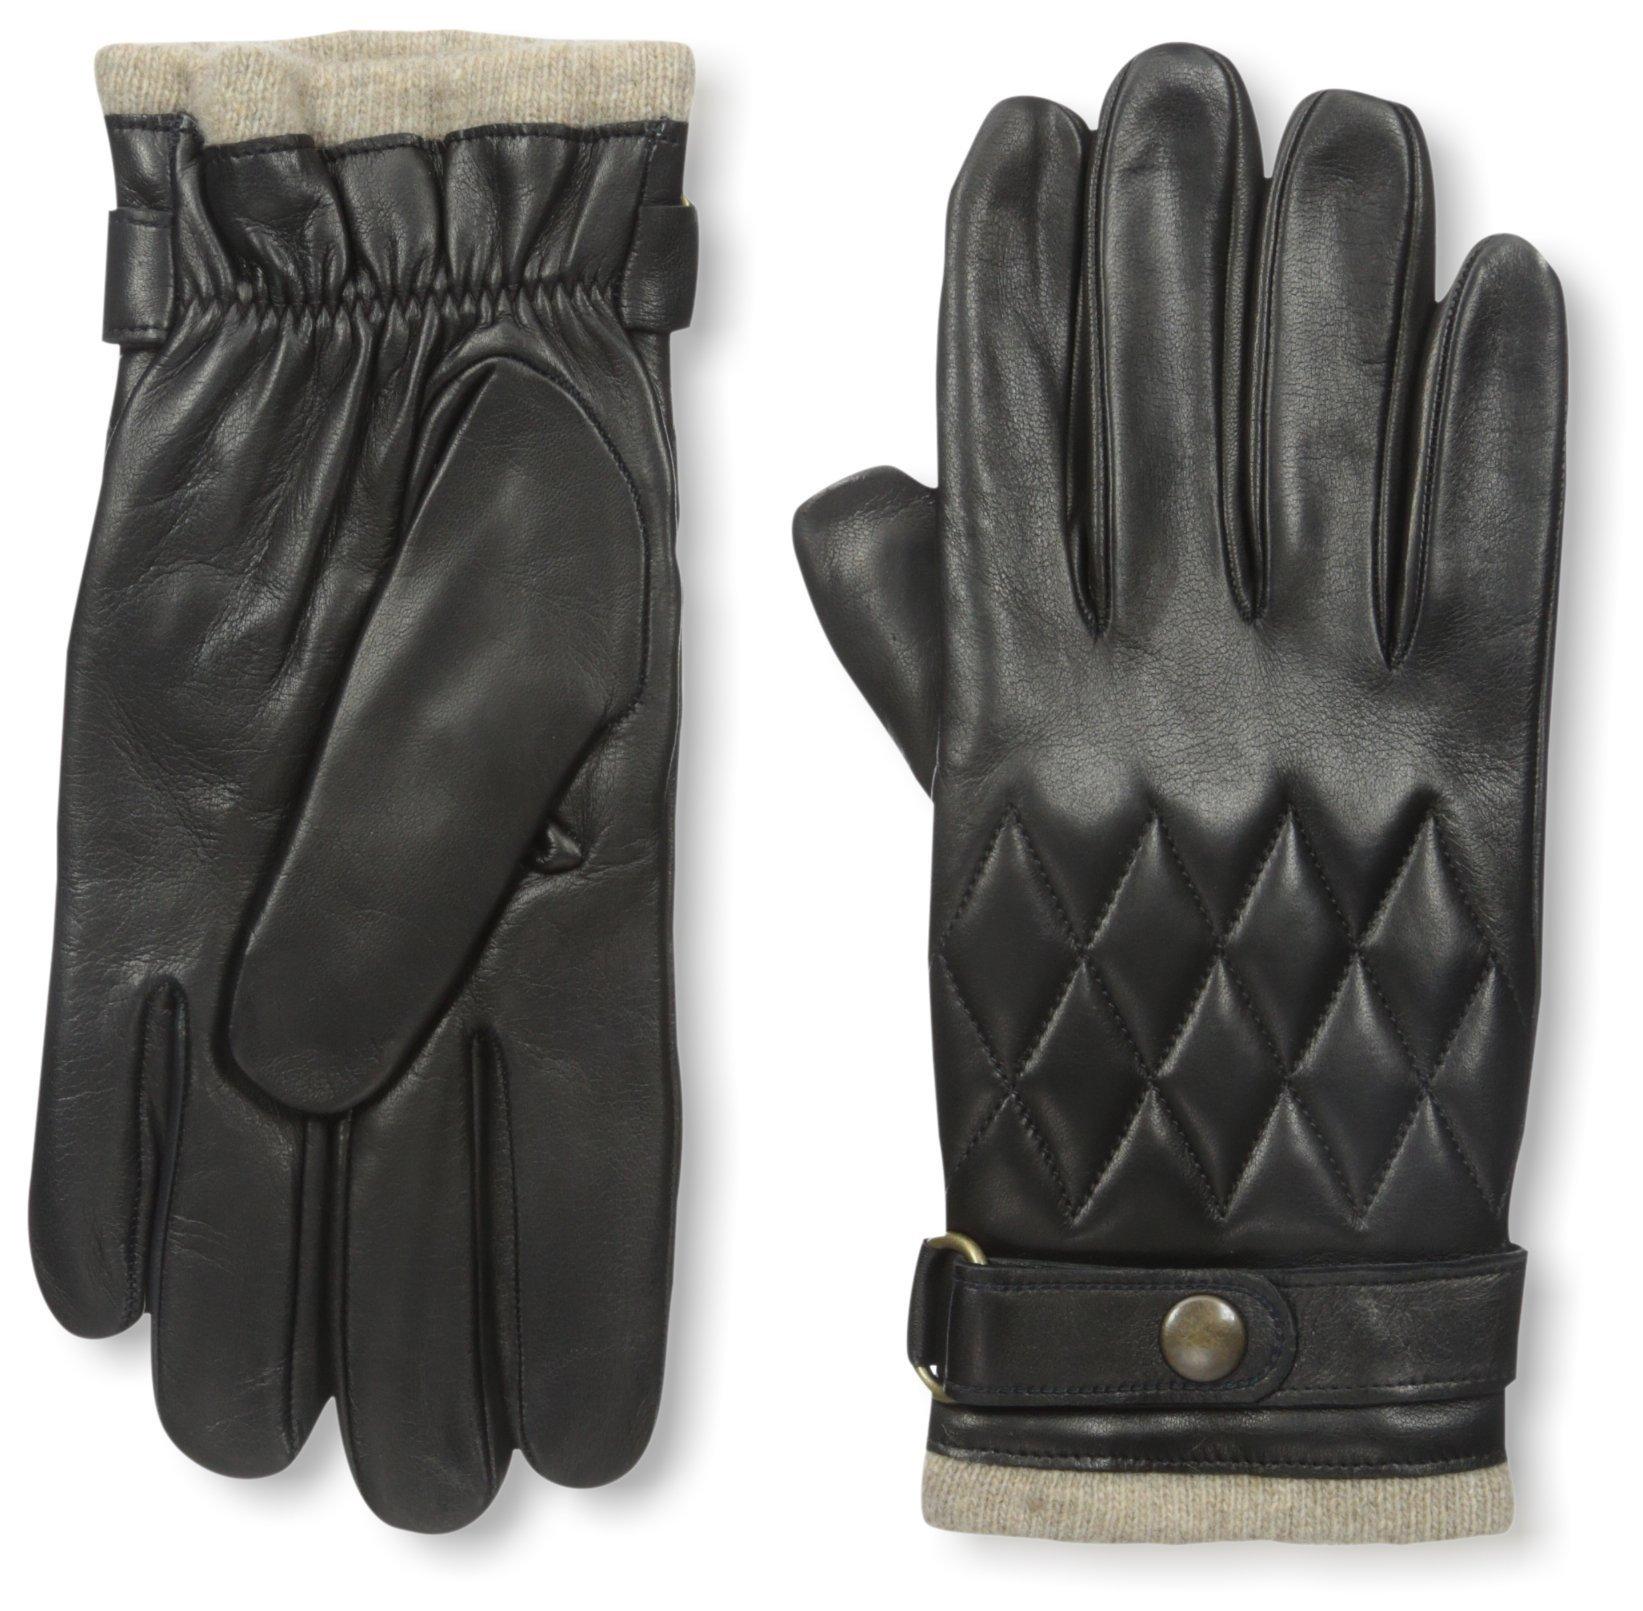 Franklin Tailored Men's Nappa Snap Closure Glove, Black, L